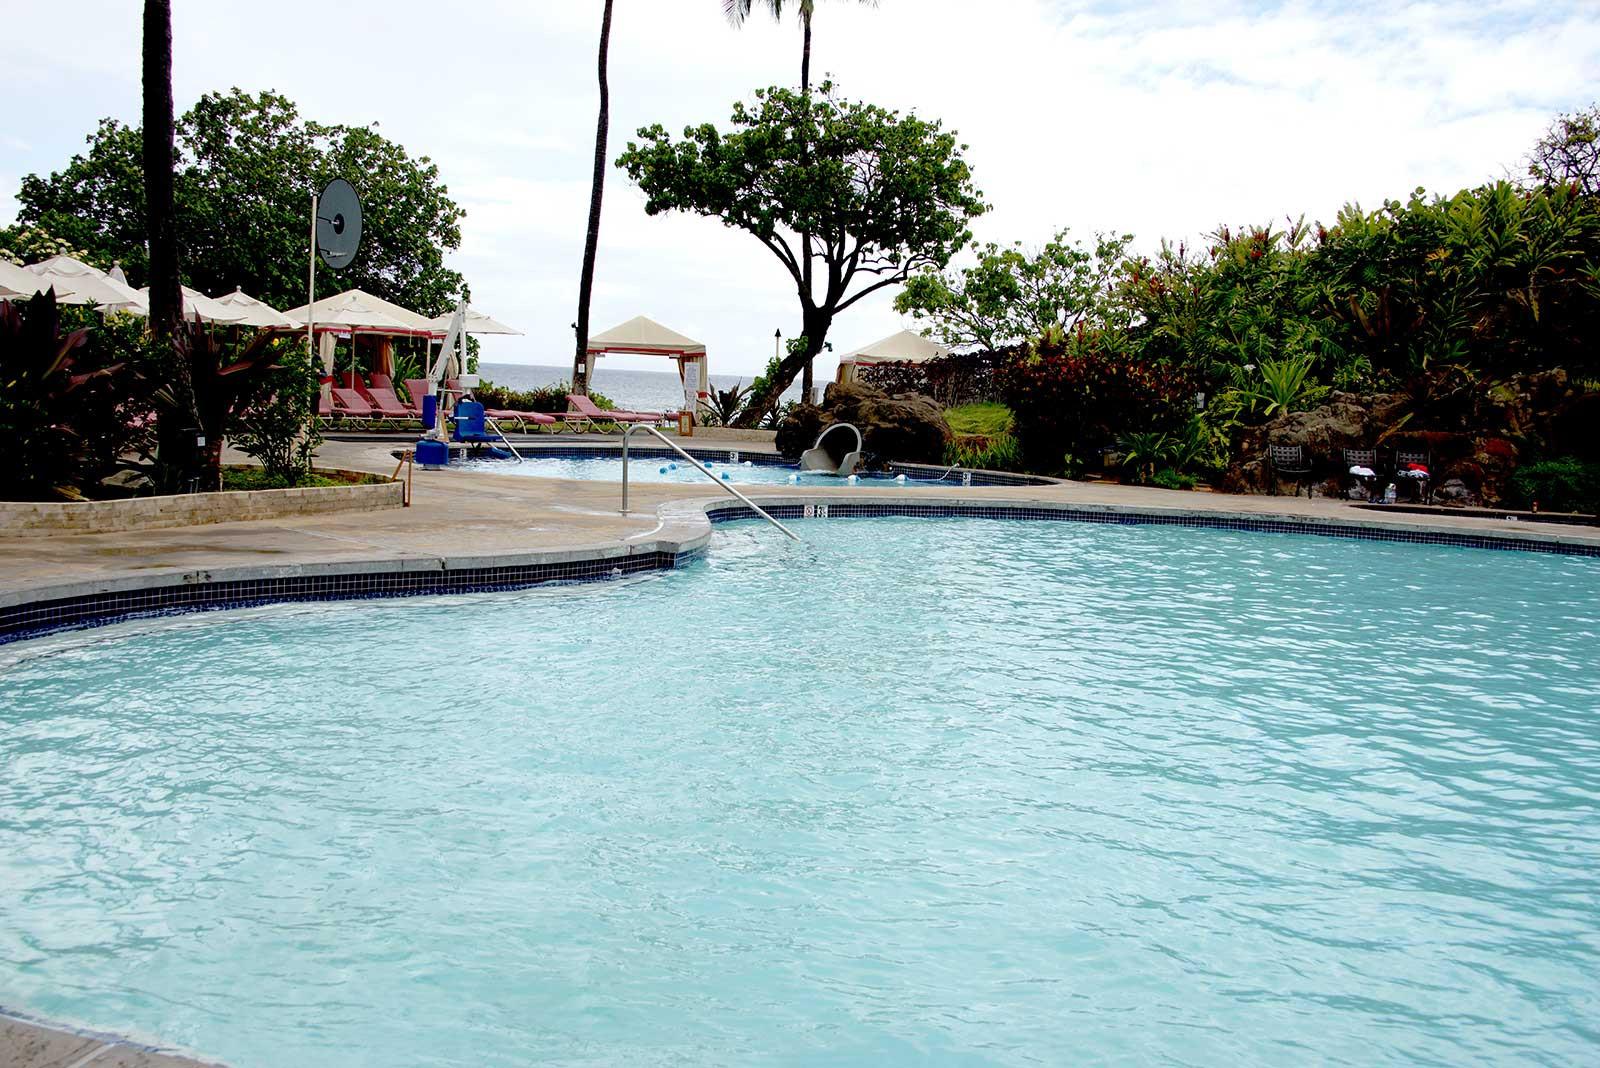 diamond-resort-maui-kaanapali-timeshare-resales-12